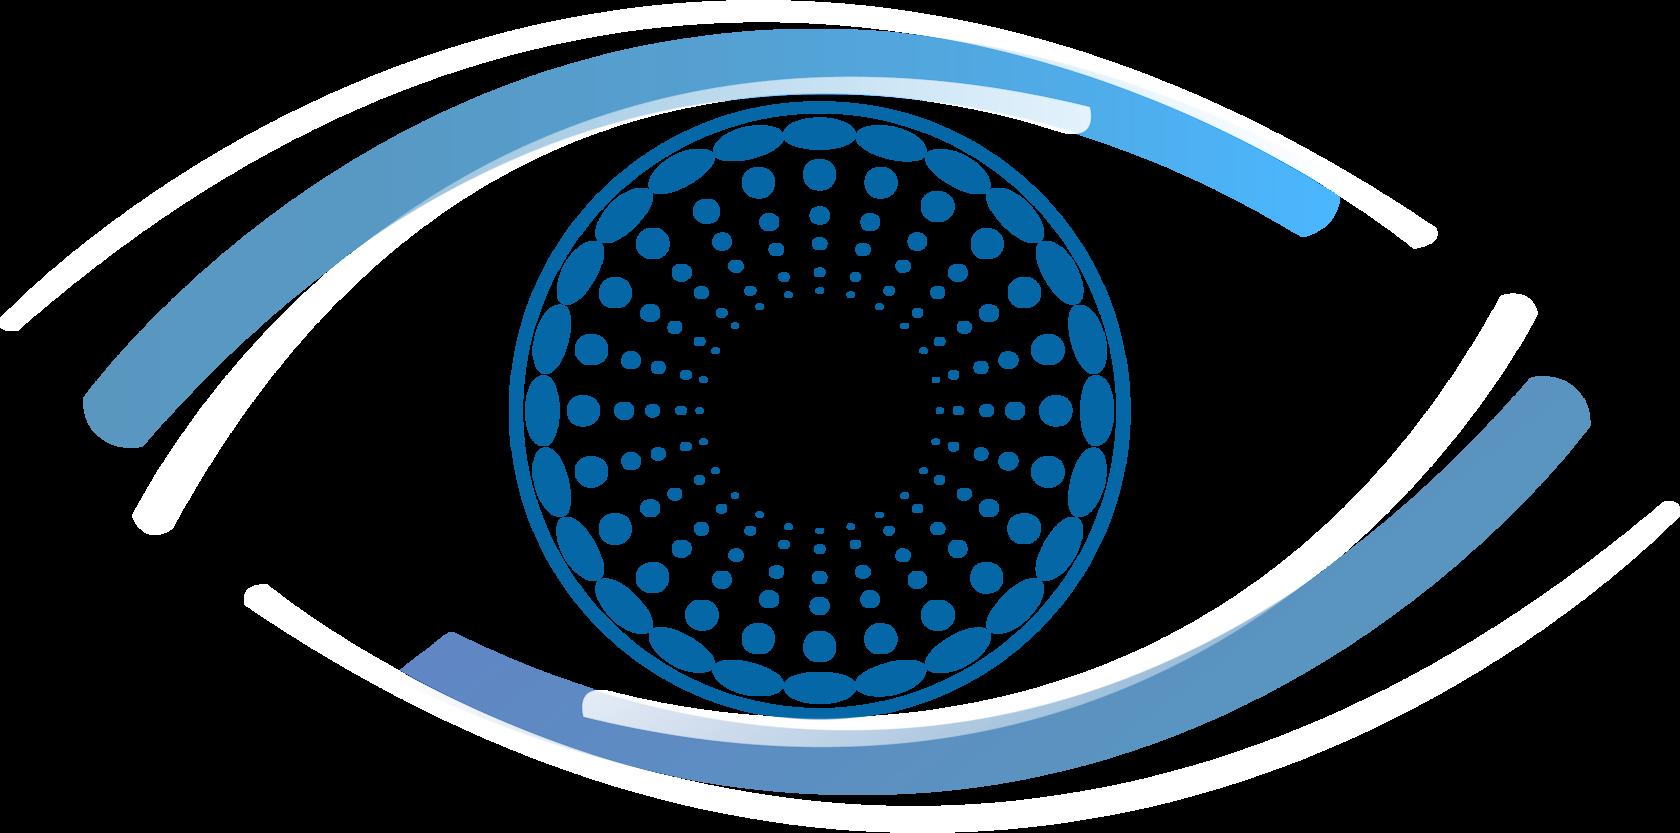 НИЦ офтальмологии